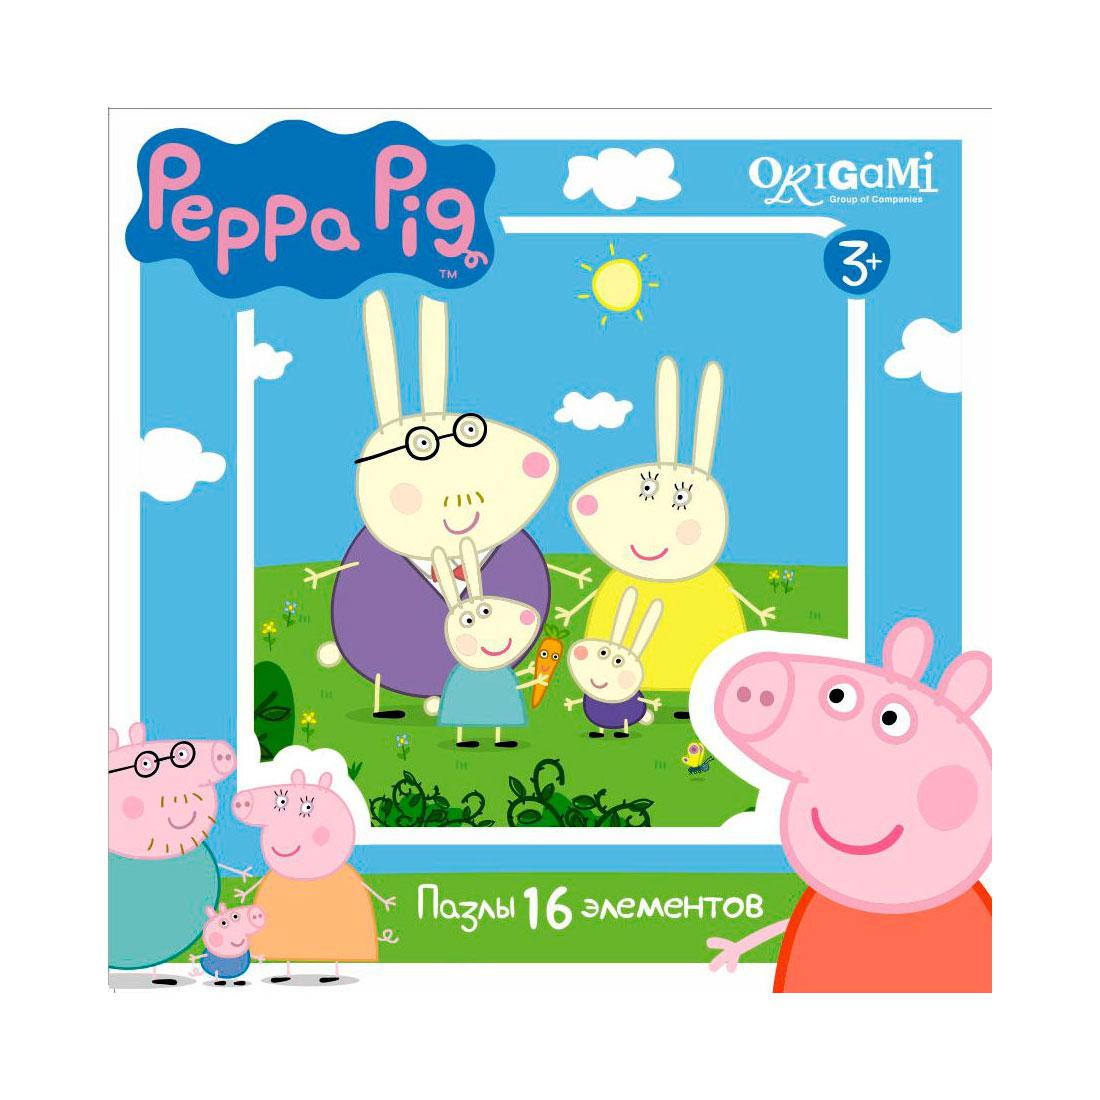 ���� Origami Peppa Pig 01577